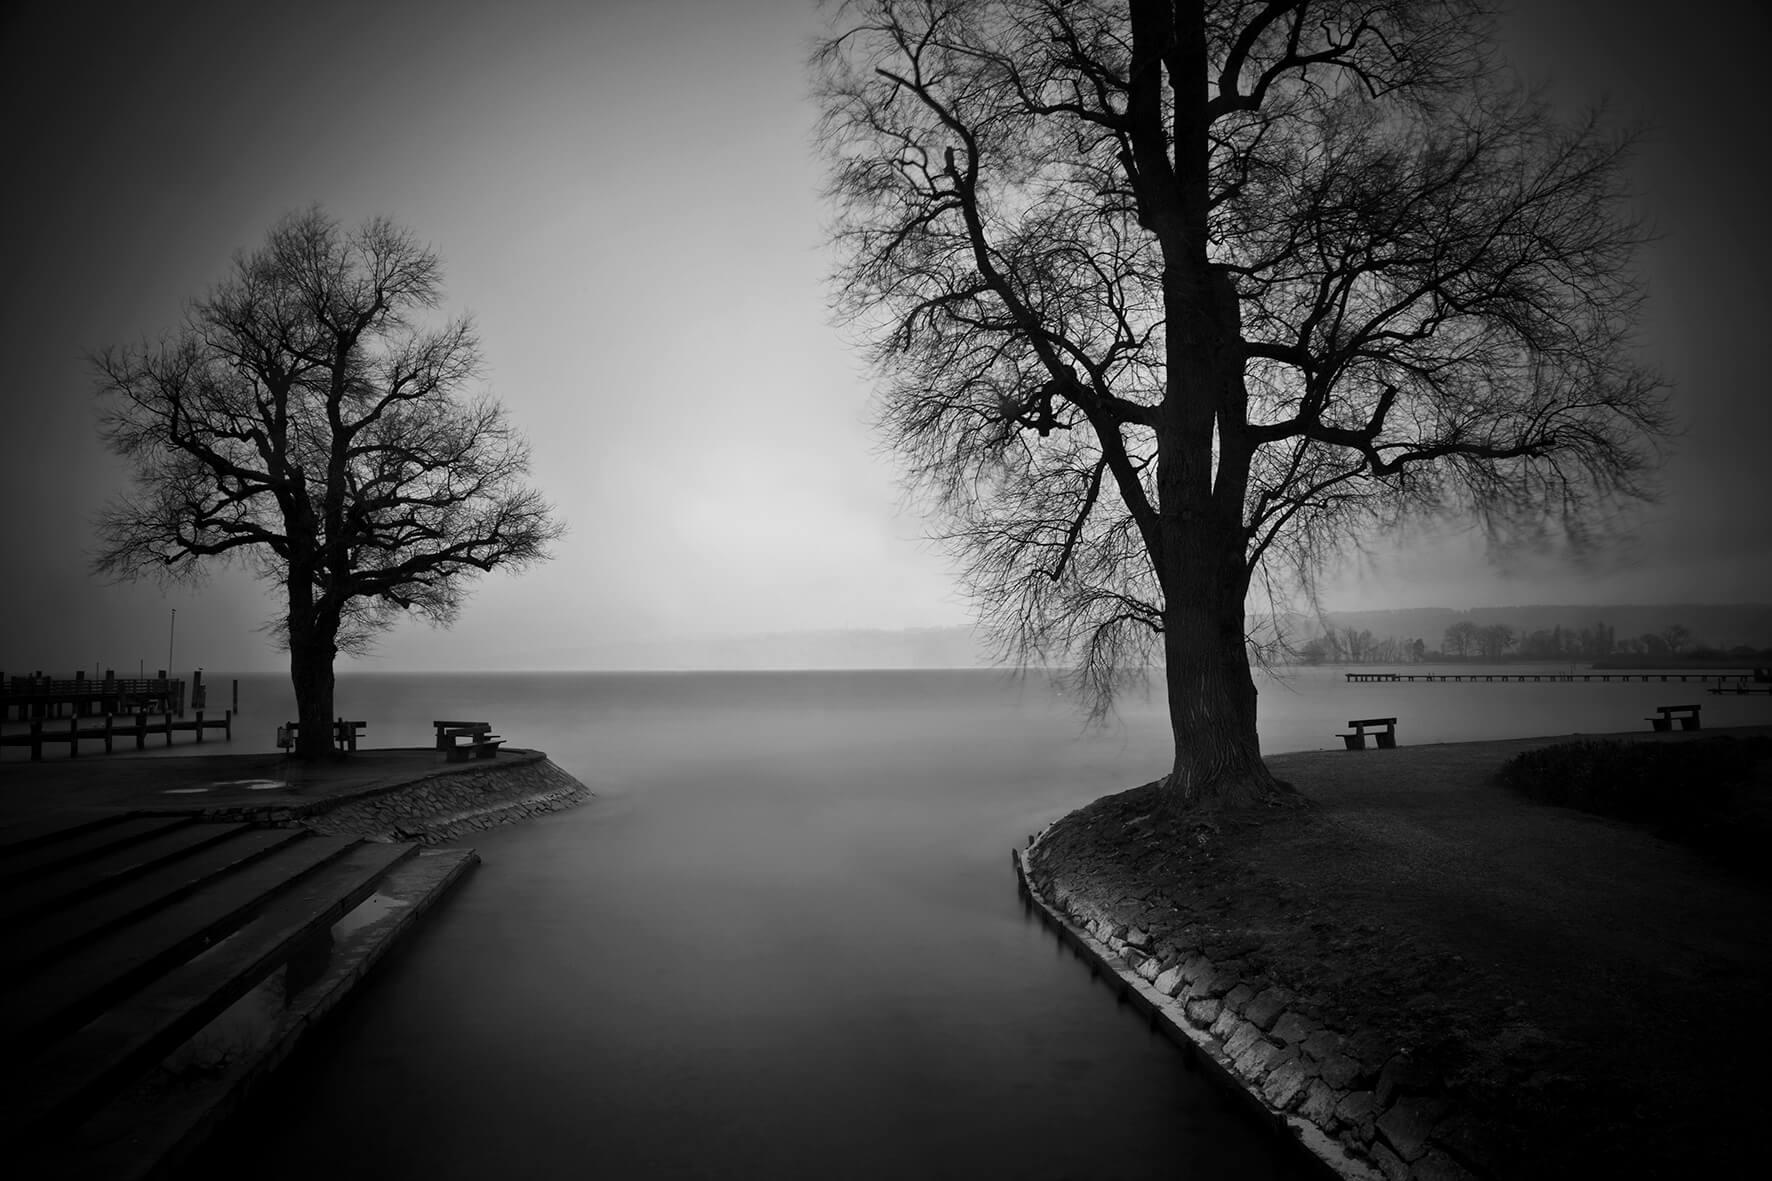 FotoszeneAEG, © Udo Reinhardt